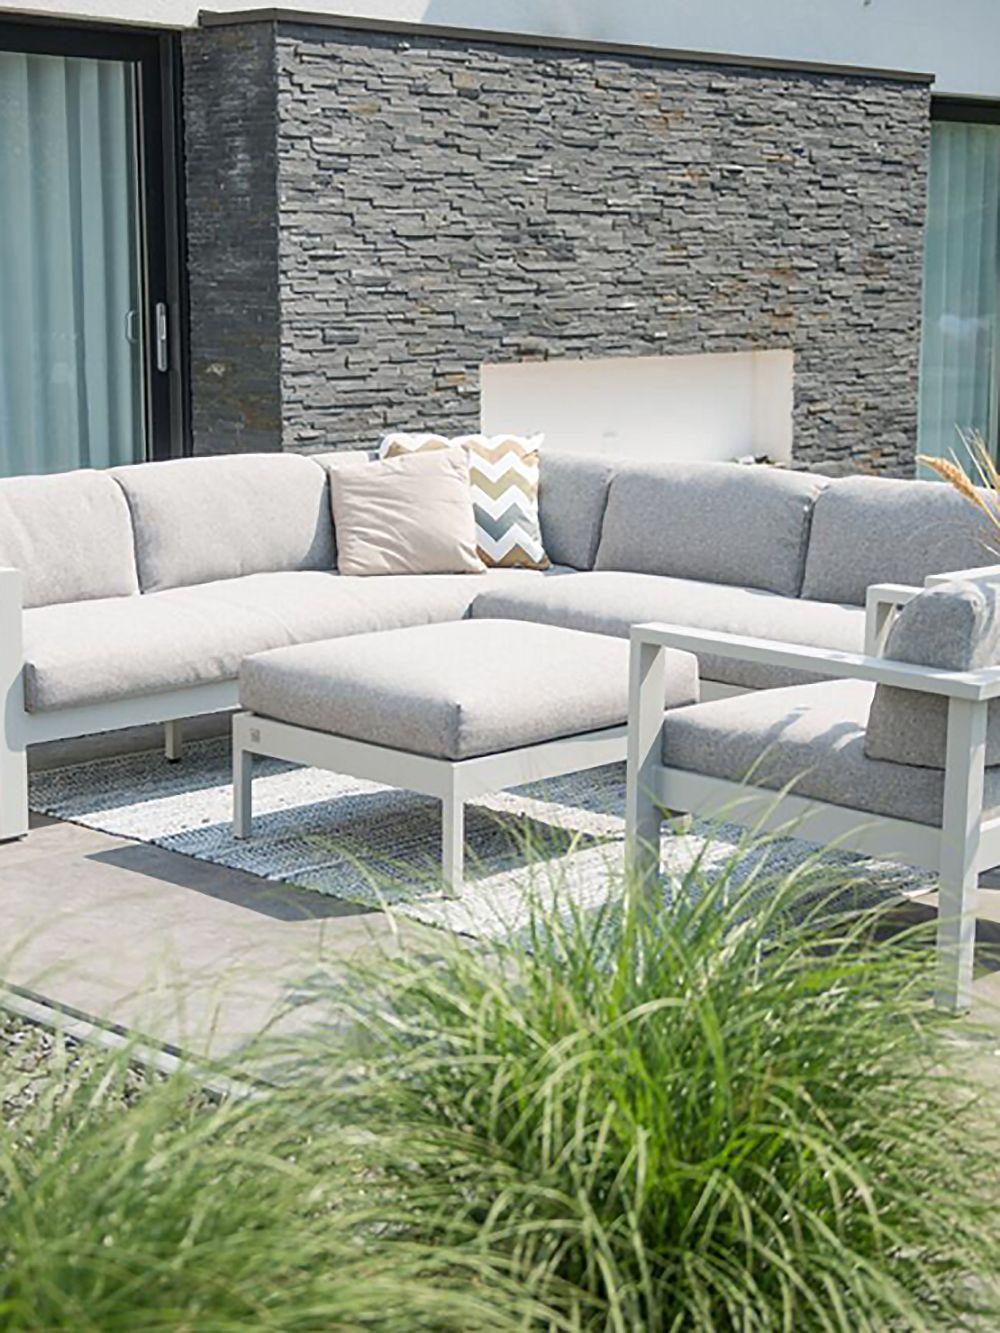 4 seasons outdoor galaxy outdoor furniture at john lewis partners rh johnlewis com seasons garden furniture seasons four outdoor furniture lexington